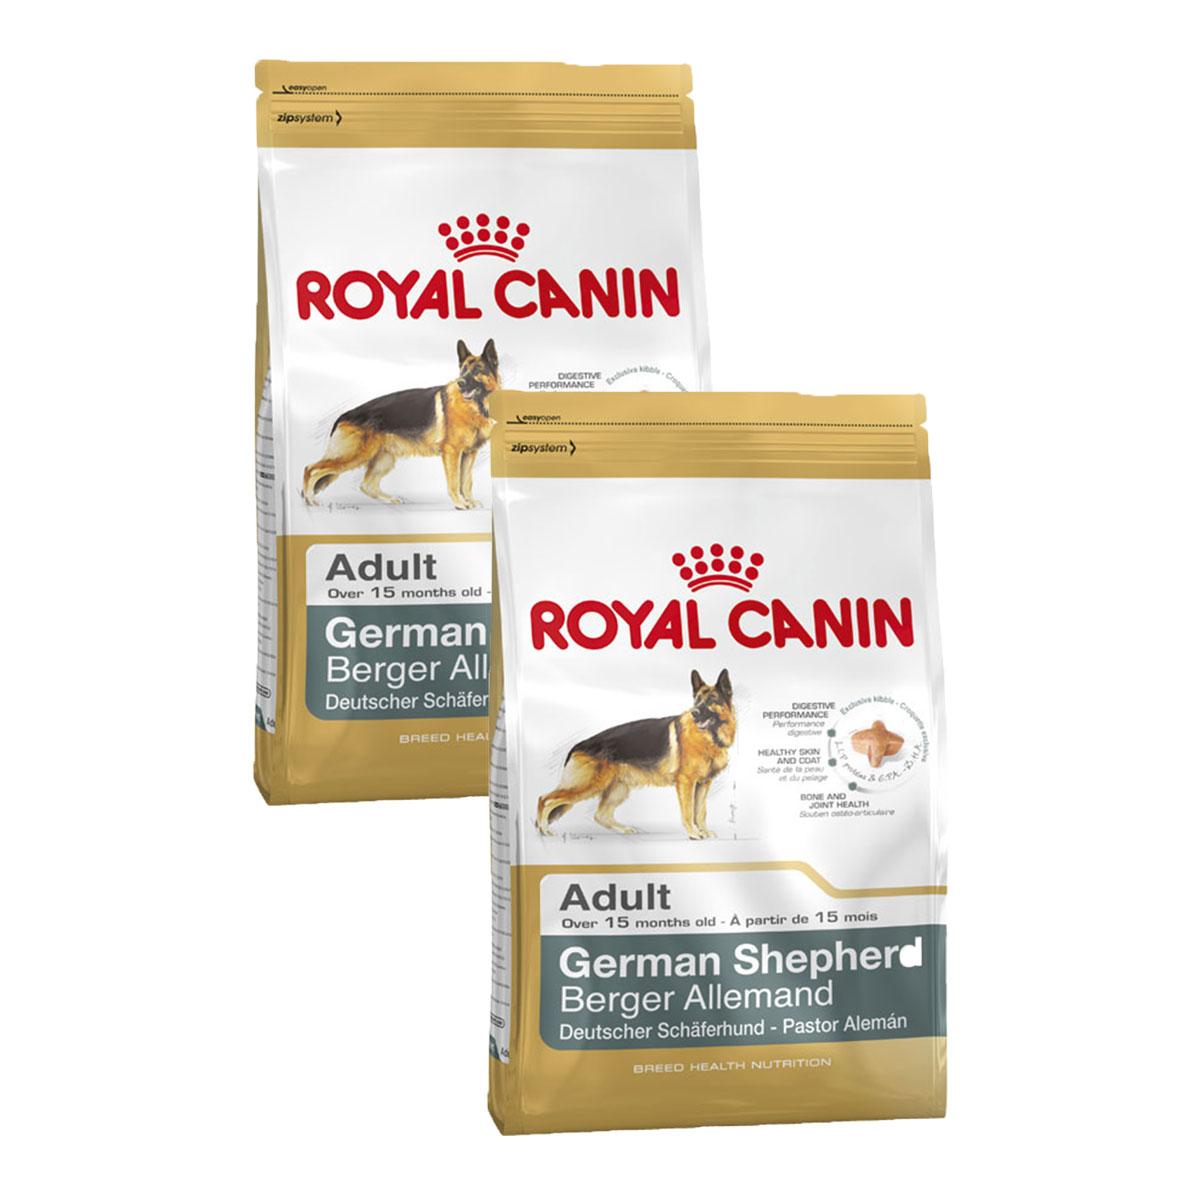 royal canin german shepherd adult g nstig kaufen bei zooroyal. Black Bedroom Furniture Sets. Home Design Ideas